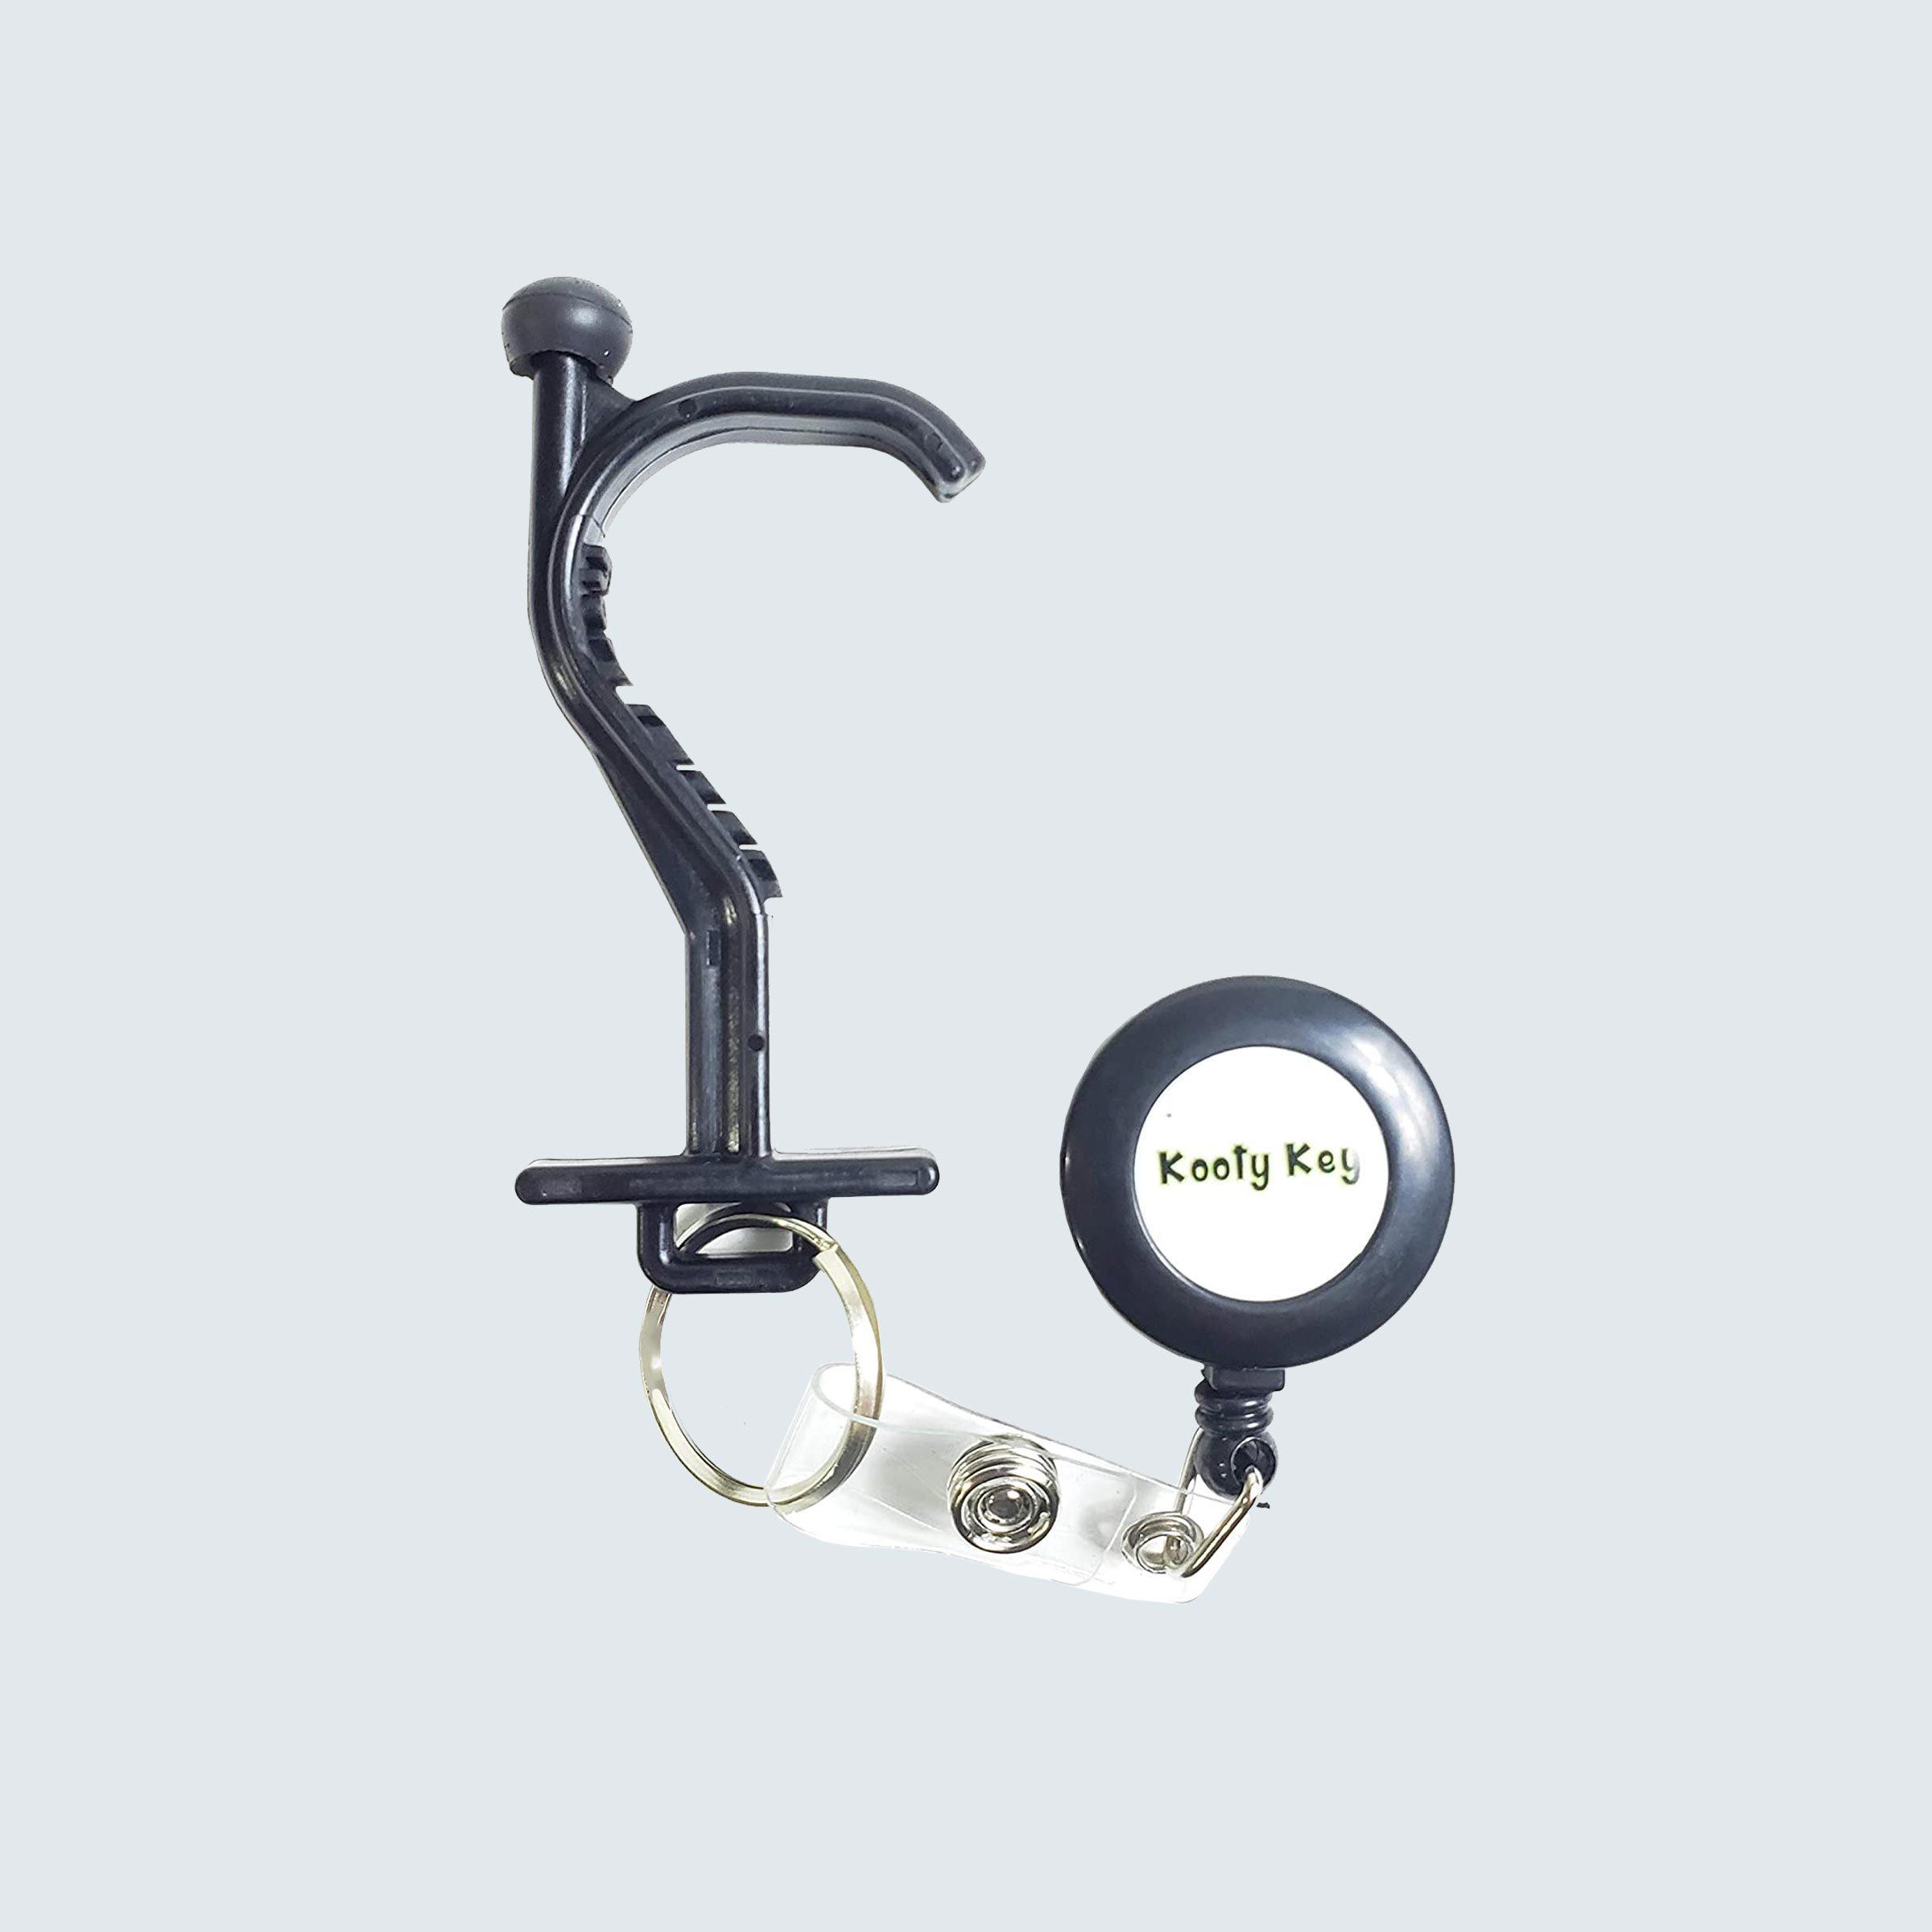 Utility hook tool